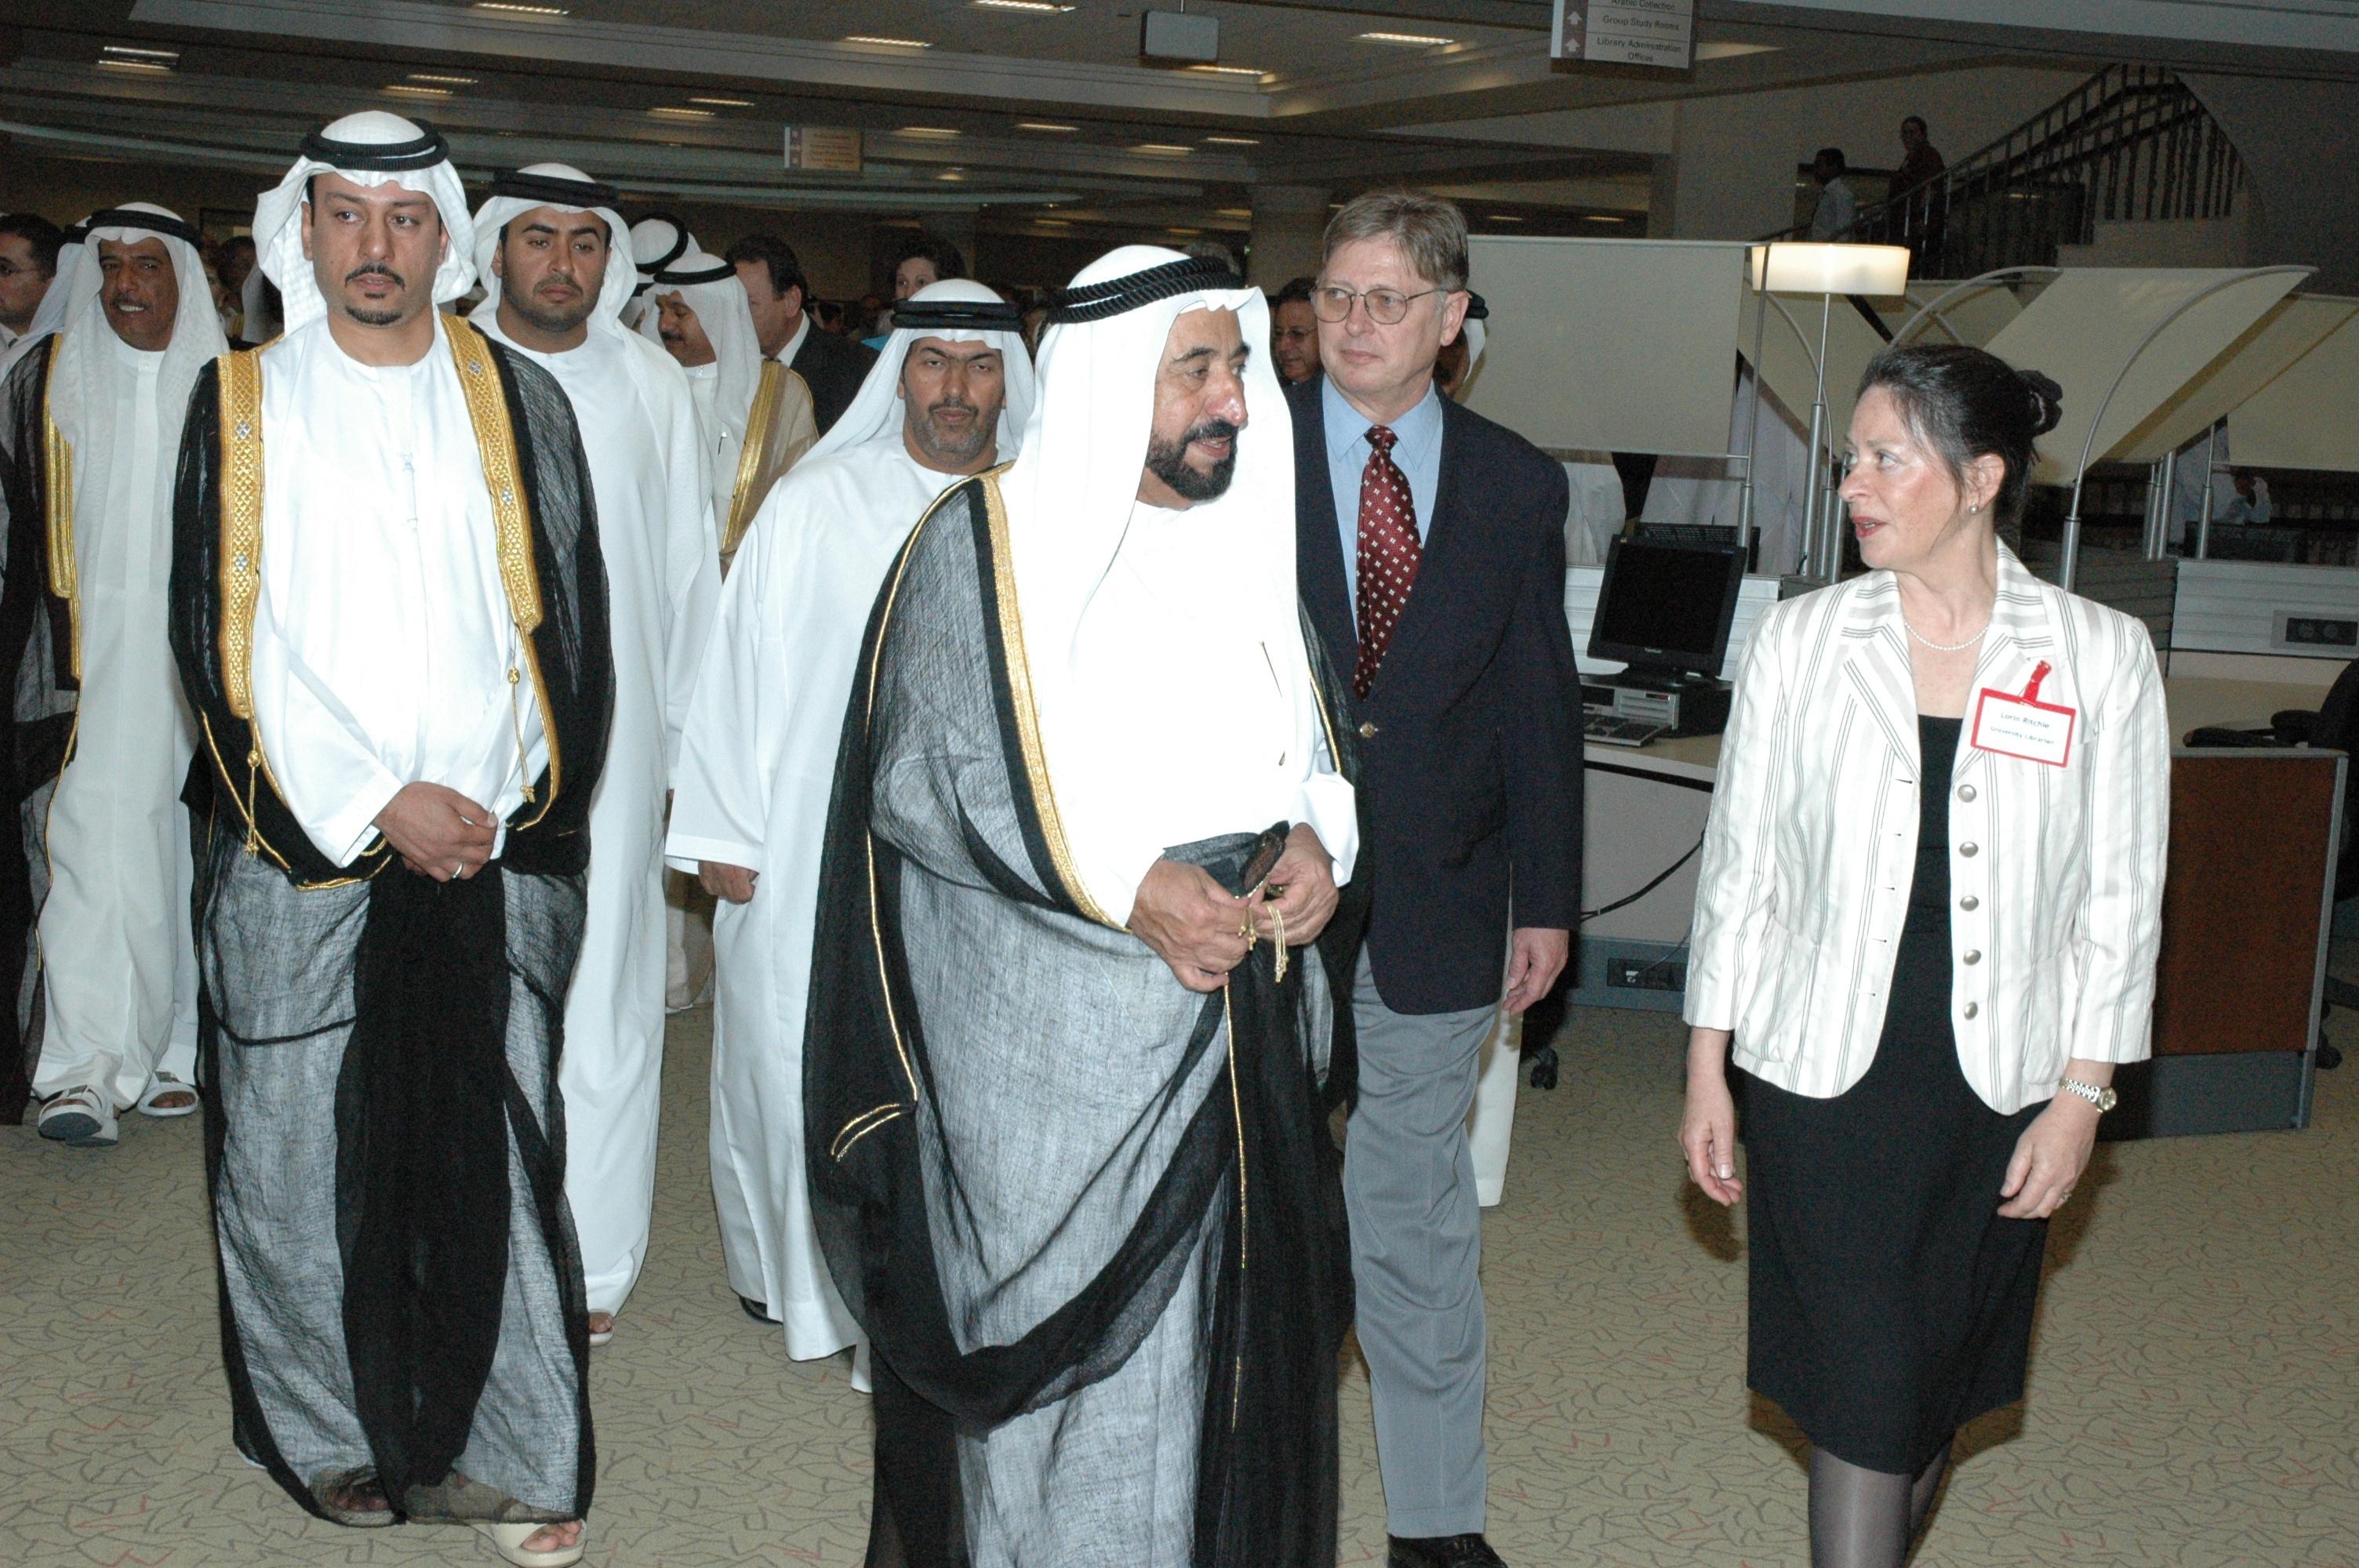 American_University_of_Sharjah_Library_13.jpg